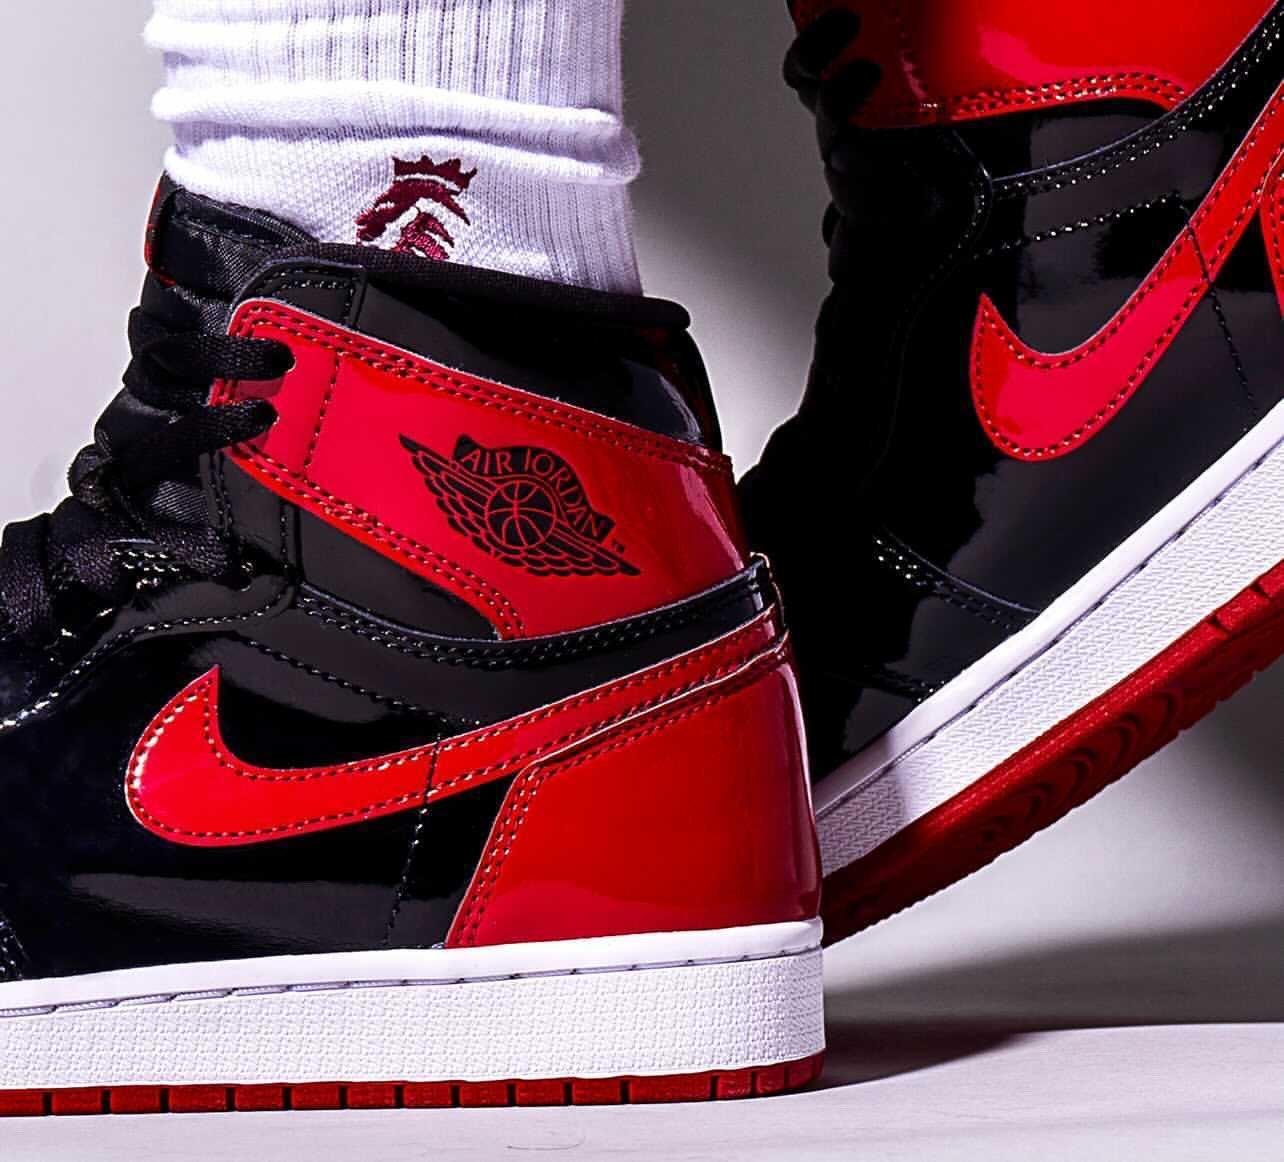 Air Jordan 1 Bred Patent 555088-063 Release Date On-Feet